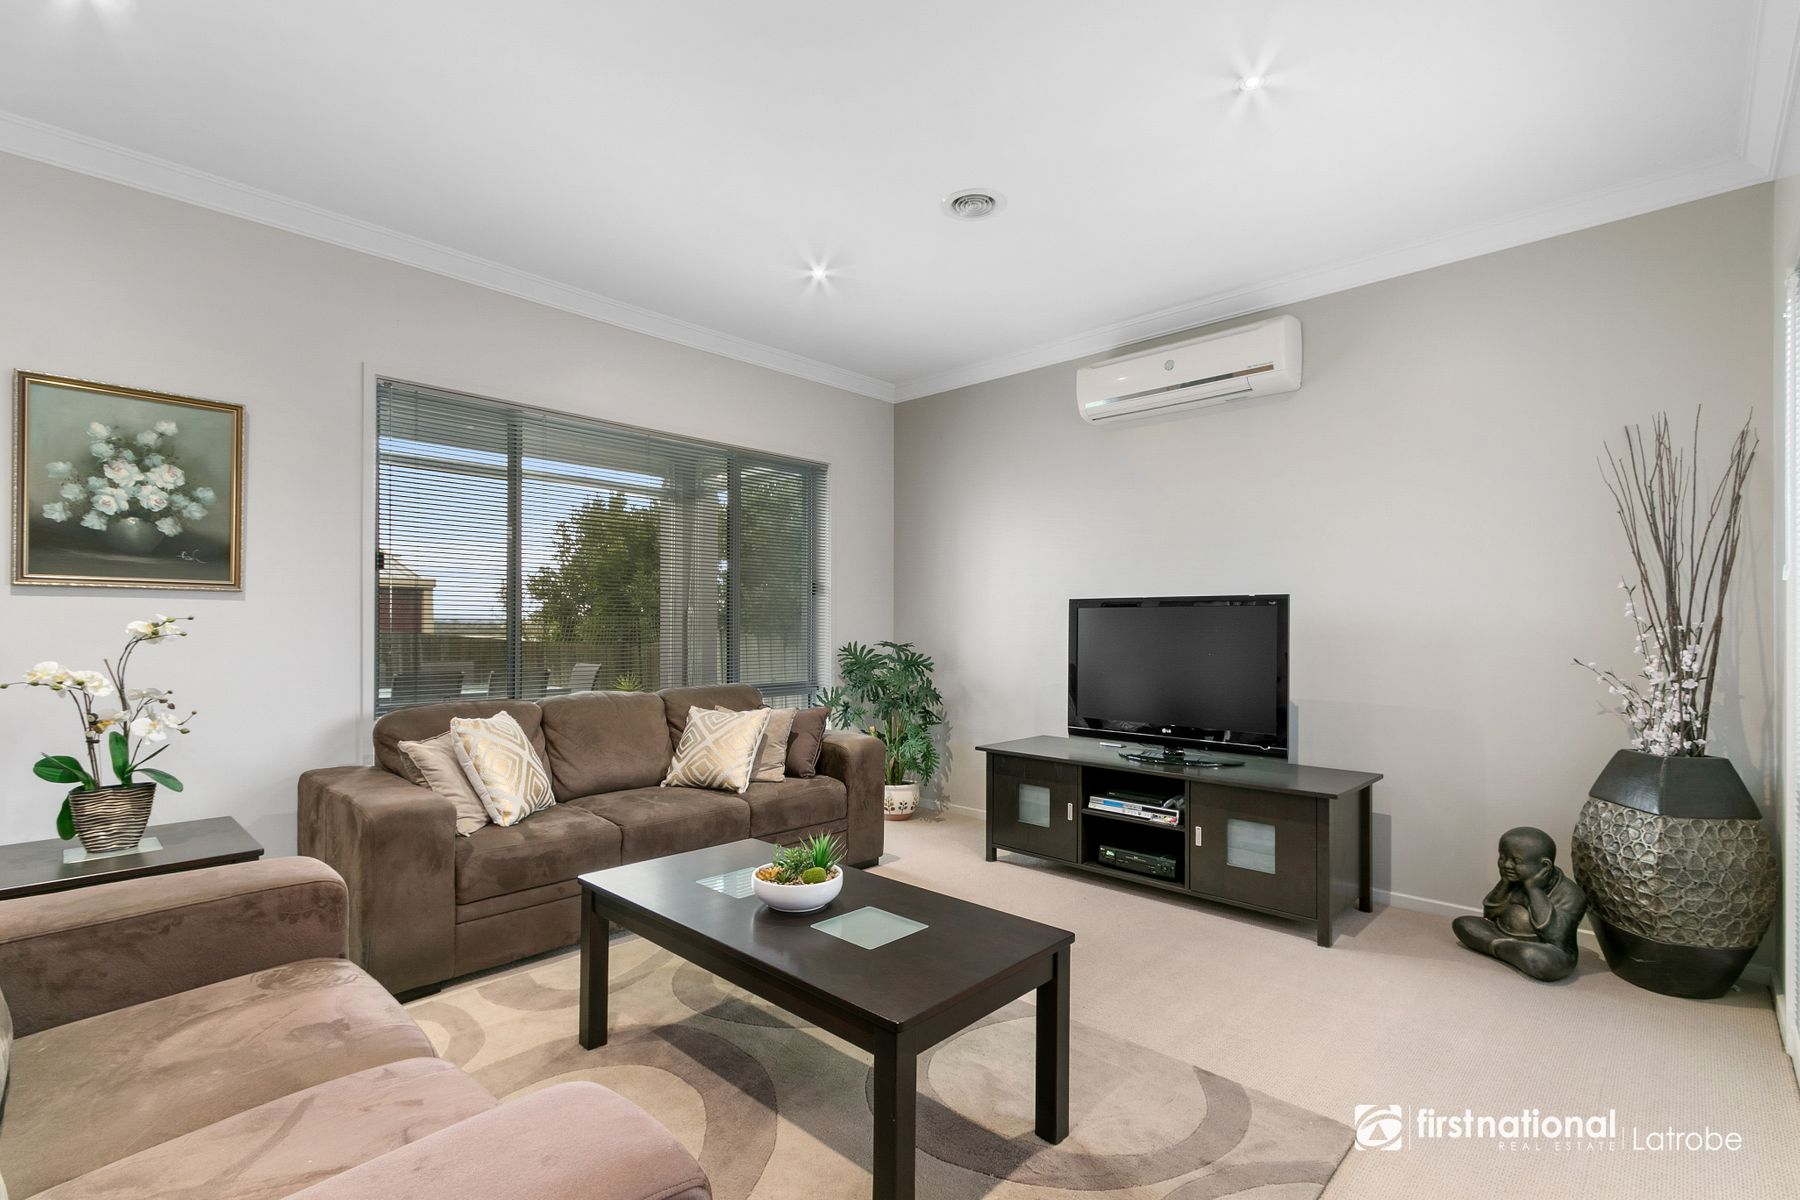 22 Wellington Drive, Traralgon, VIC 3844